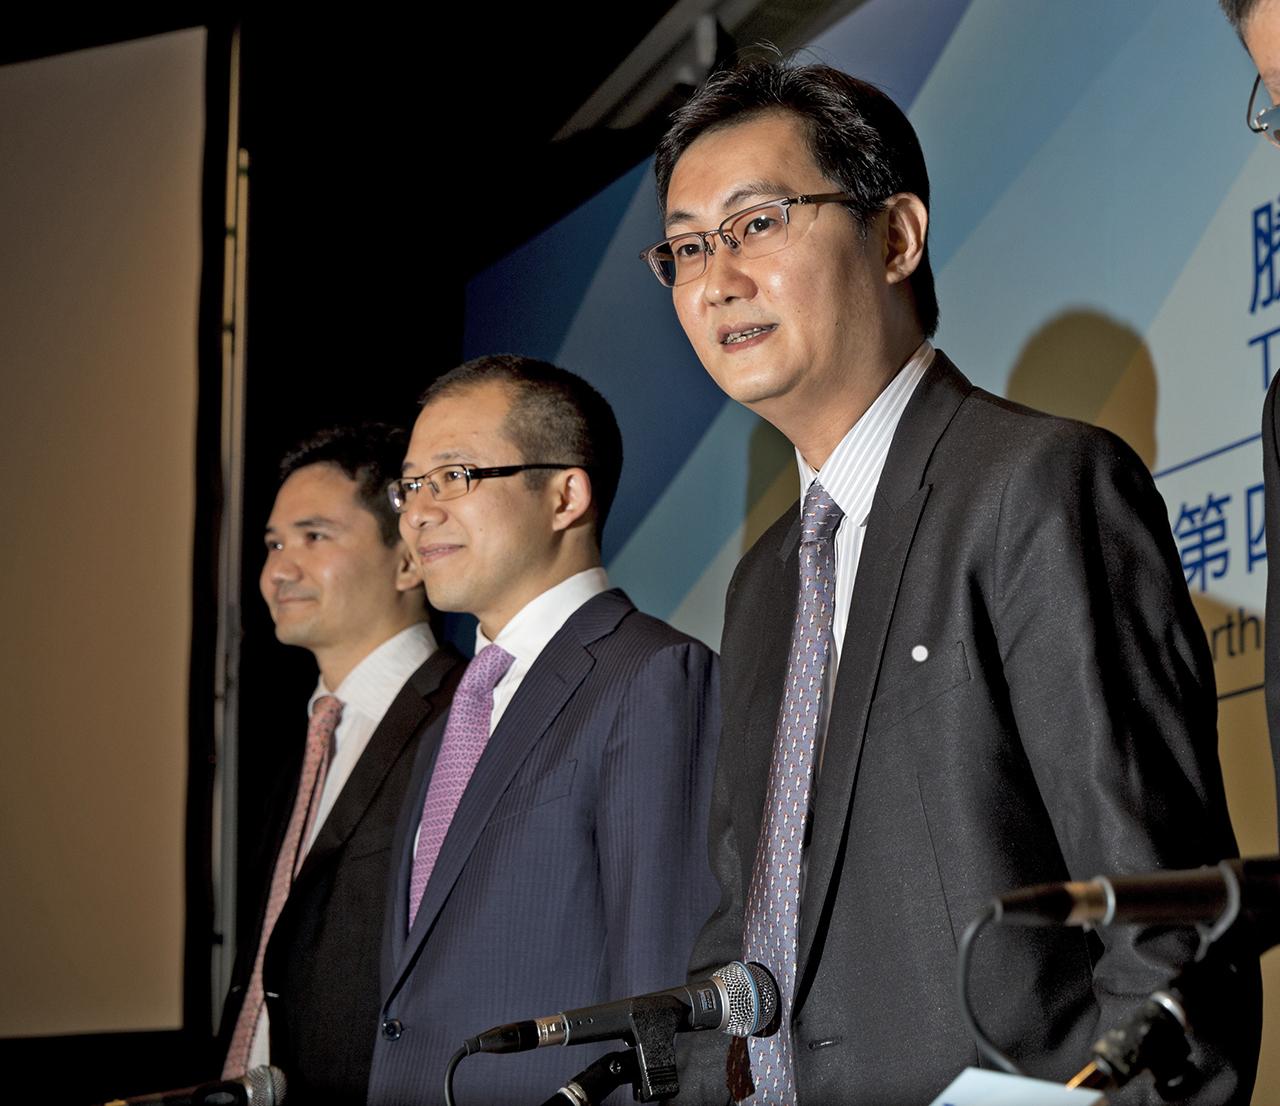 Tencent, CEO Ma Huateng